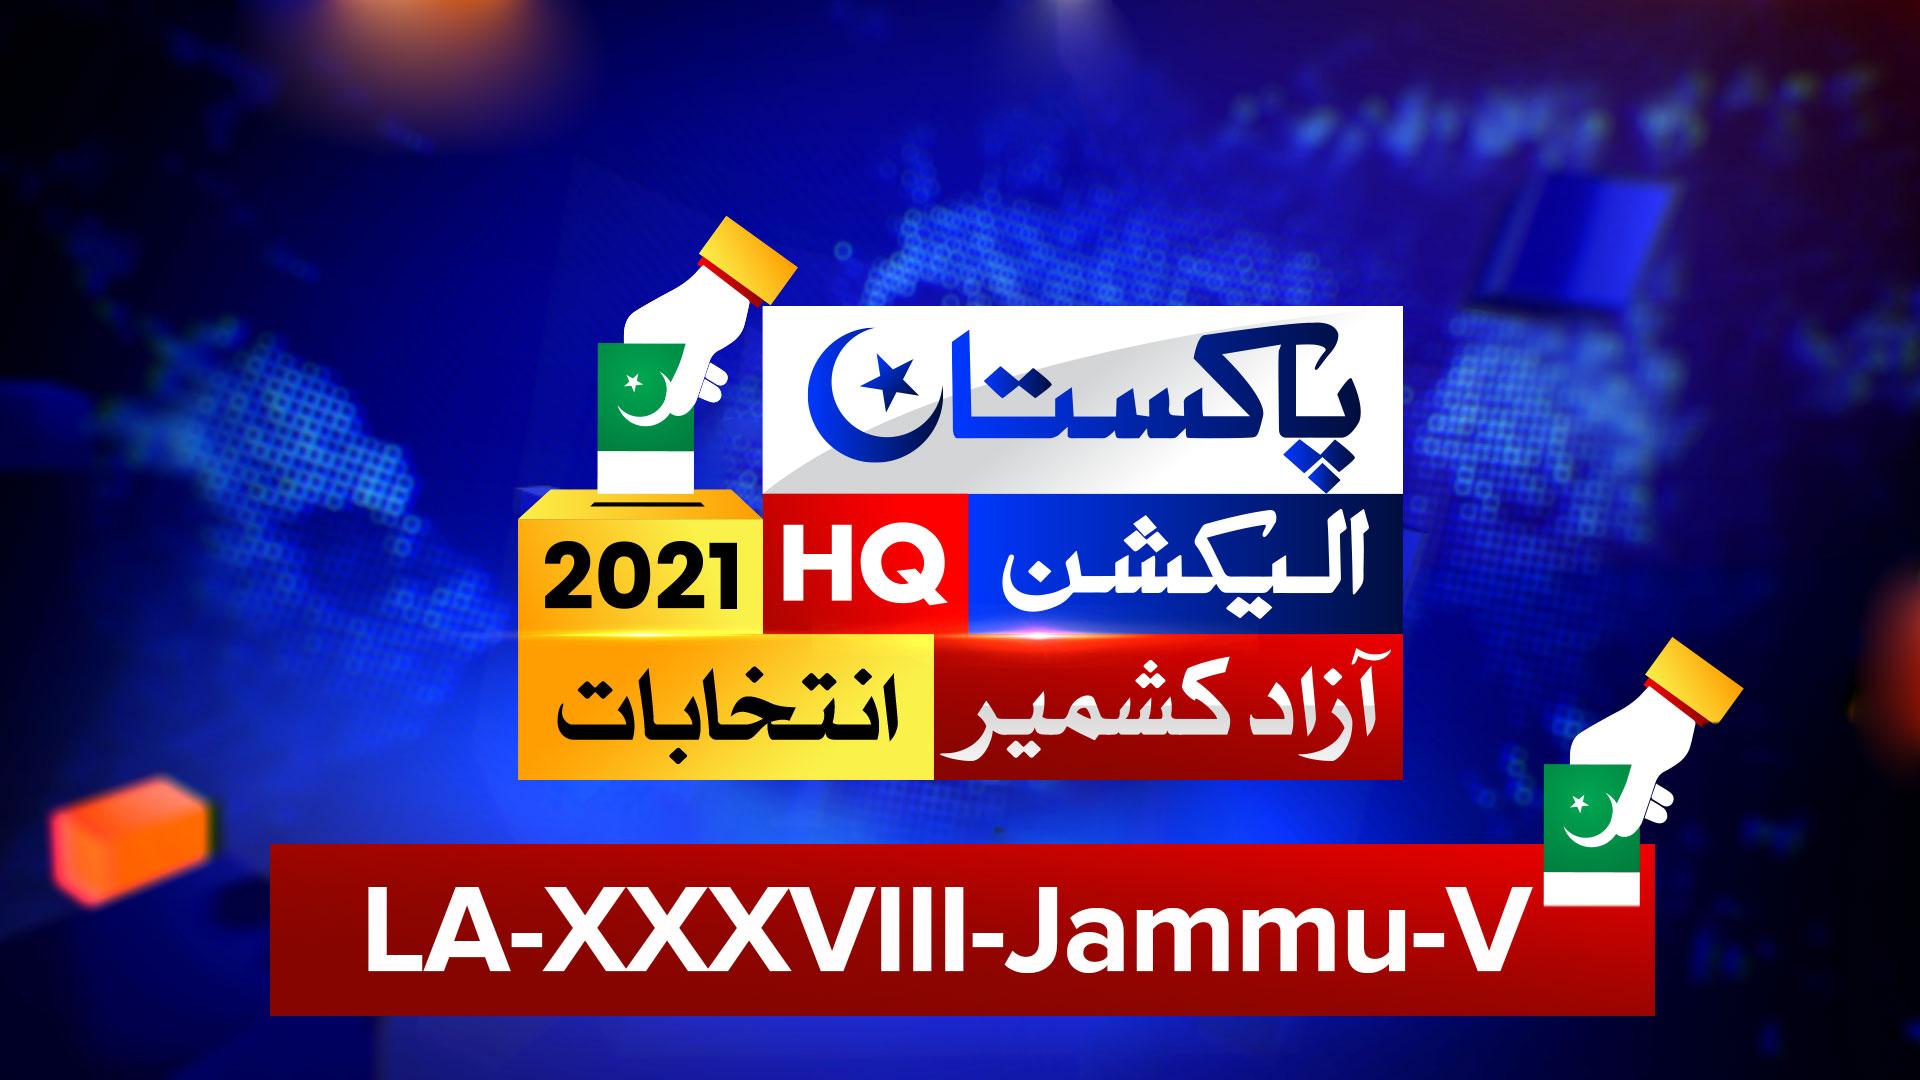 LA-XXXVIII-Jammu-V